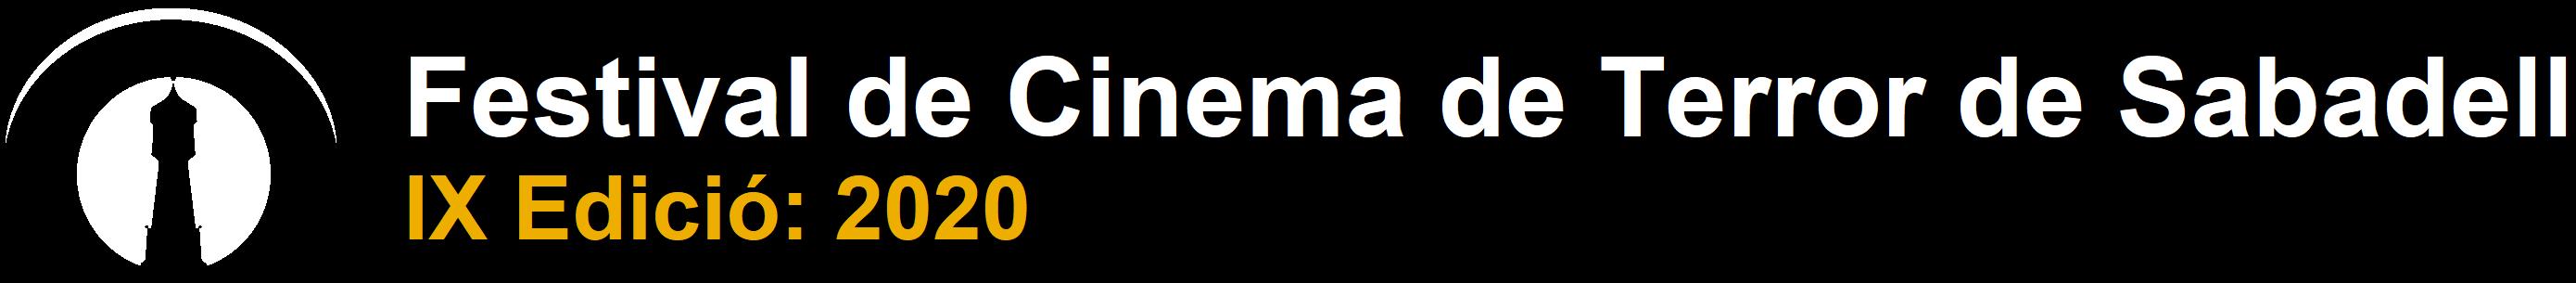 Festival de Cinema de Terror de Sabadell